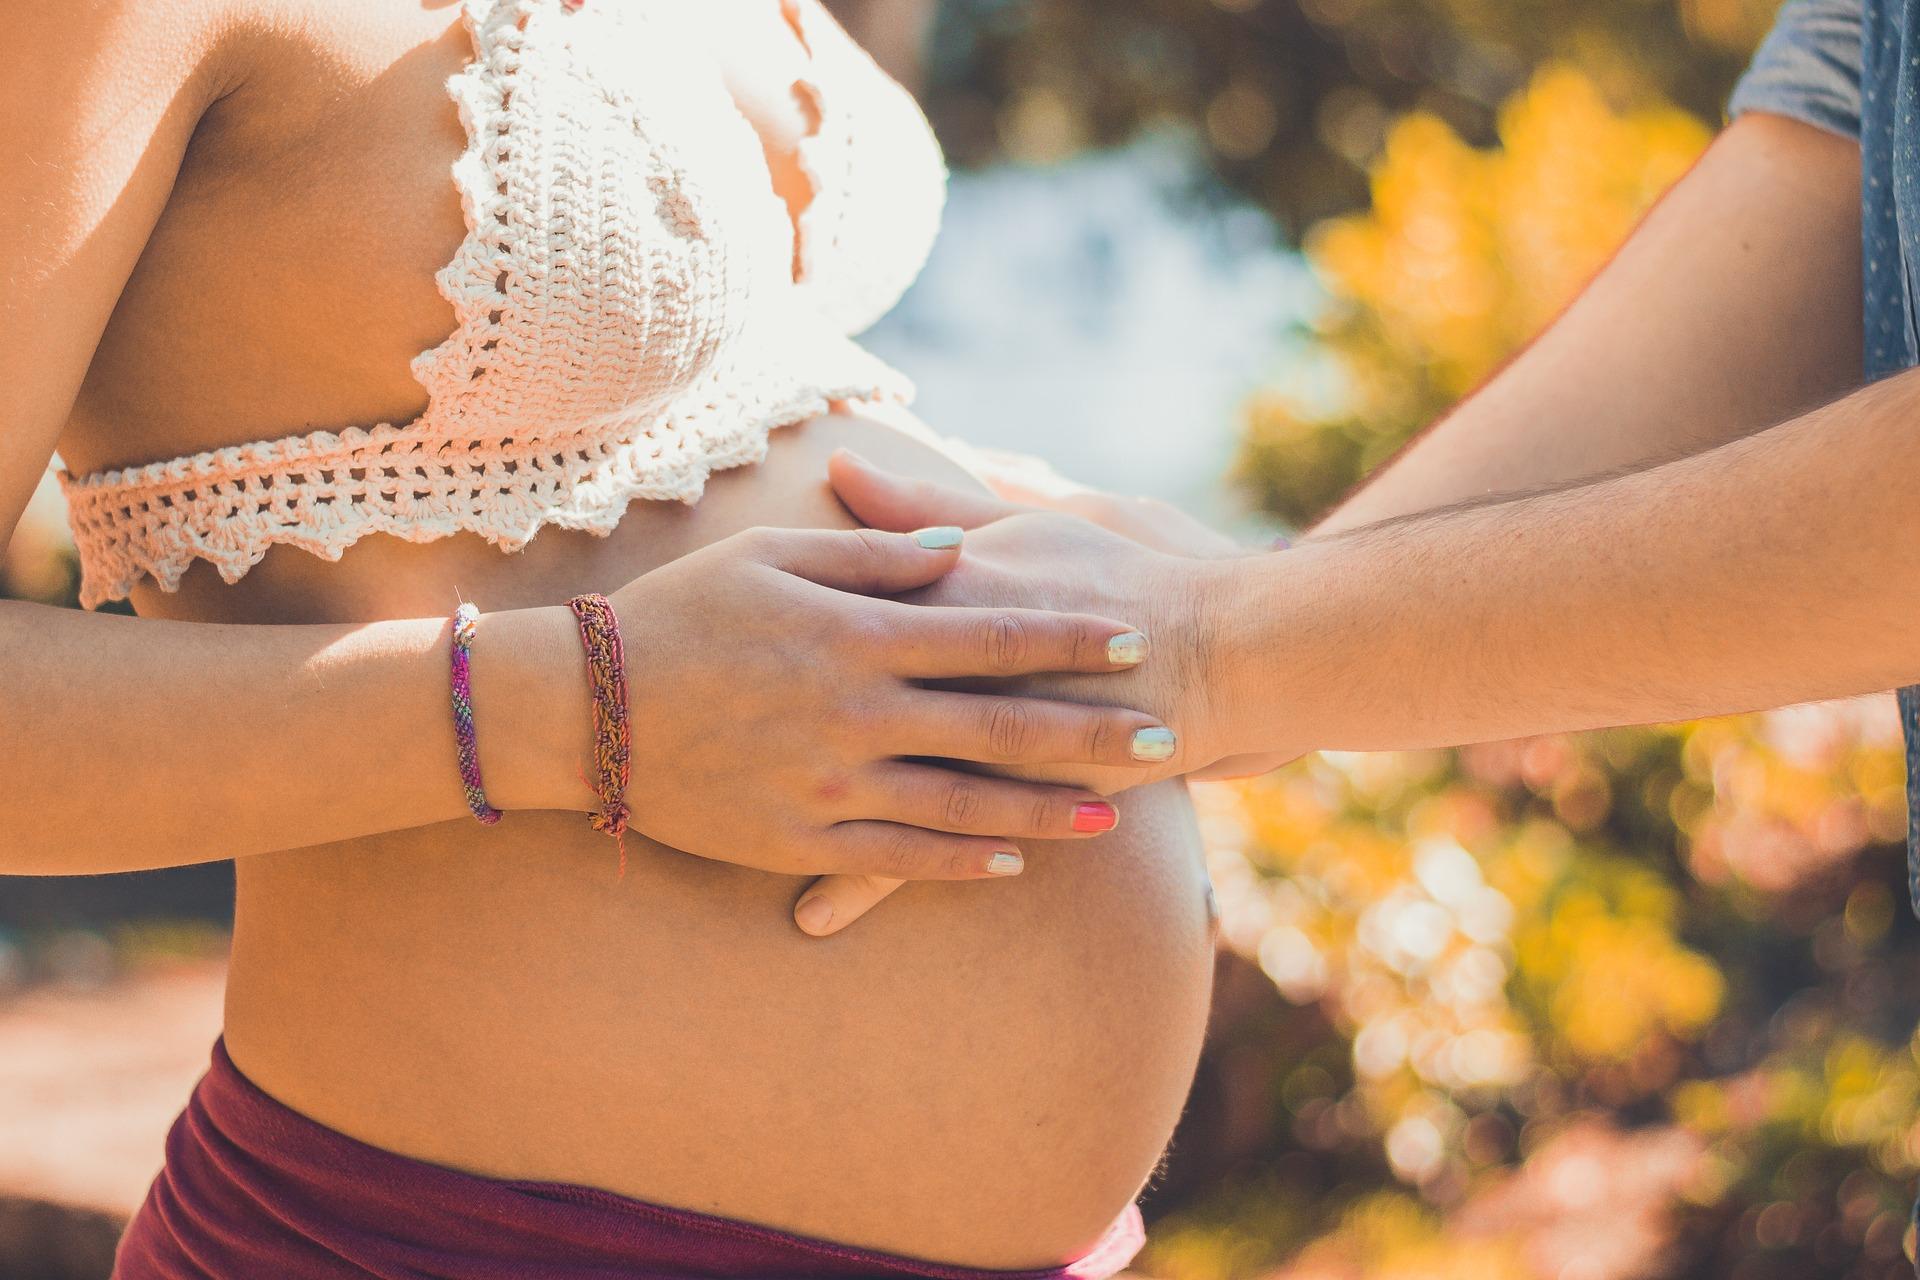 pregnant-2720434_1920.jpg